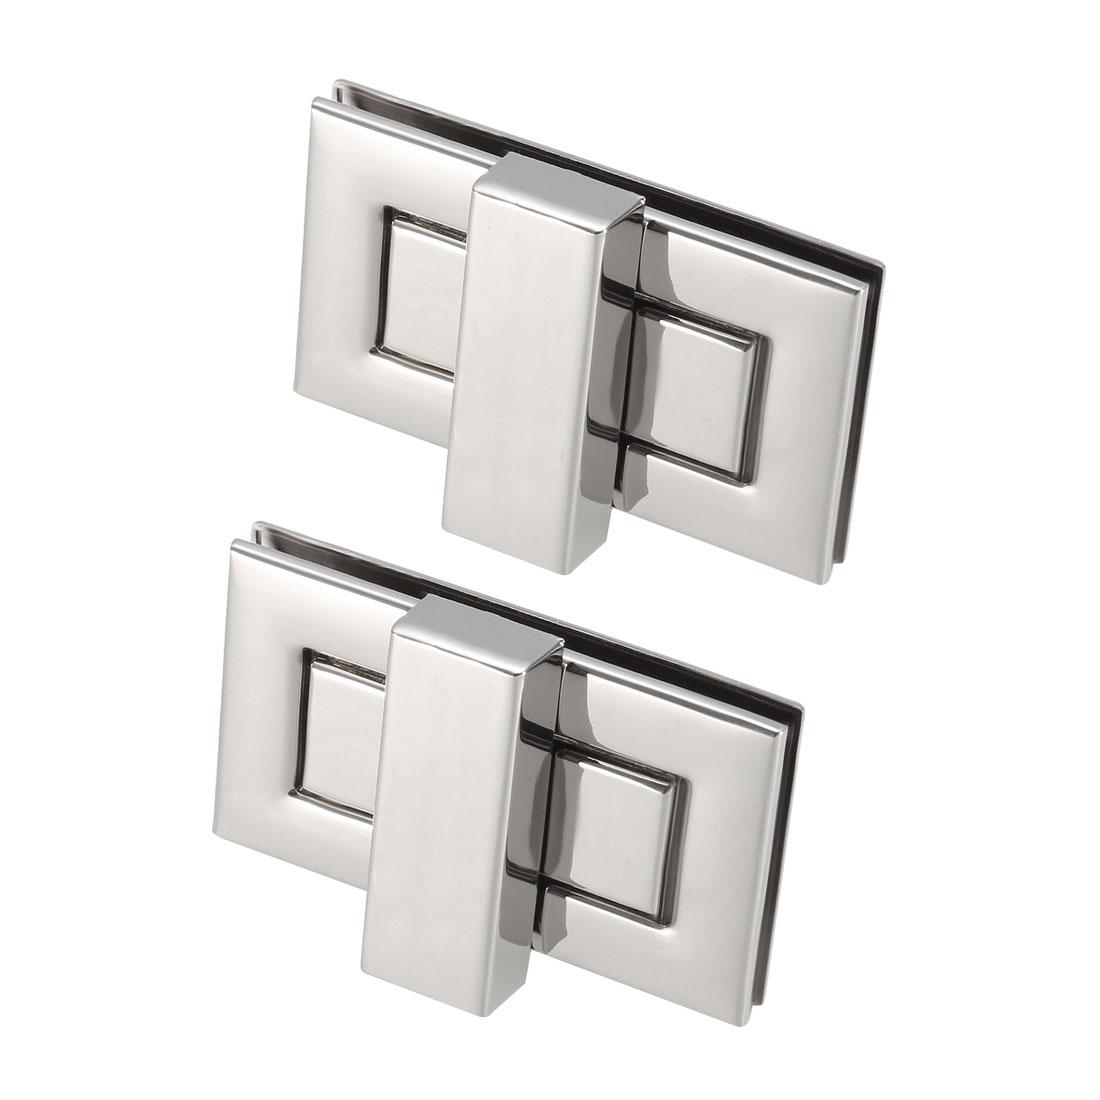 2 Sets Rectangular Purses Twist Lock 52mm x 29mm Clutches Closures - Silver